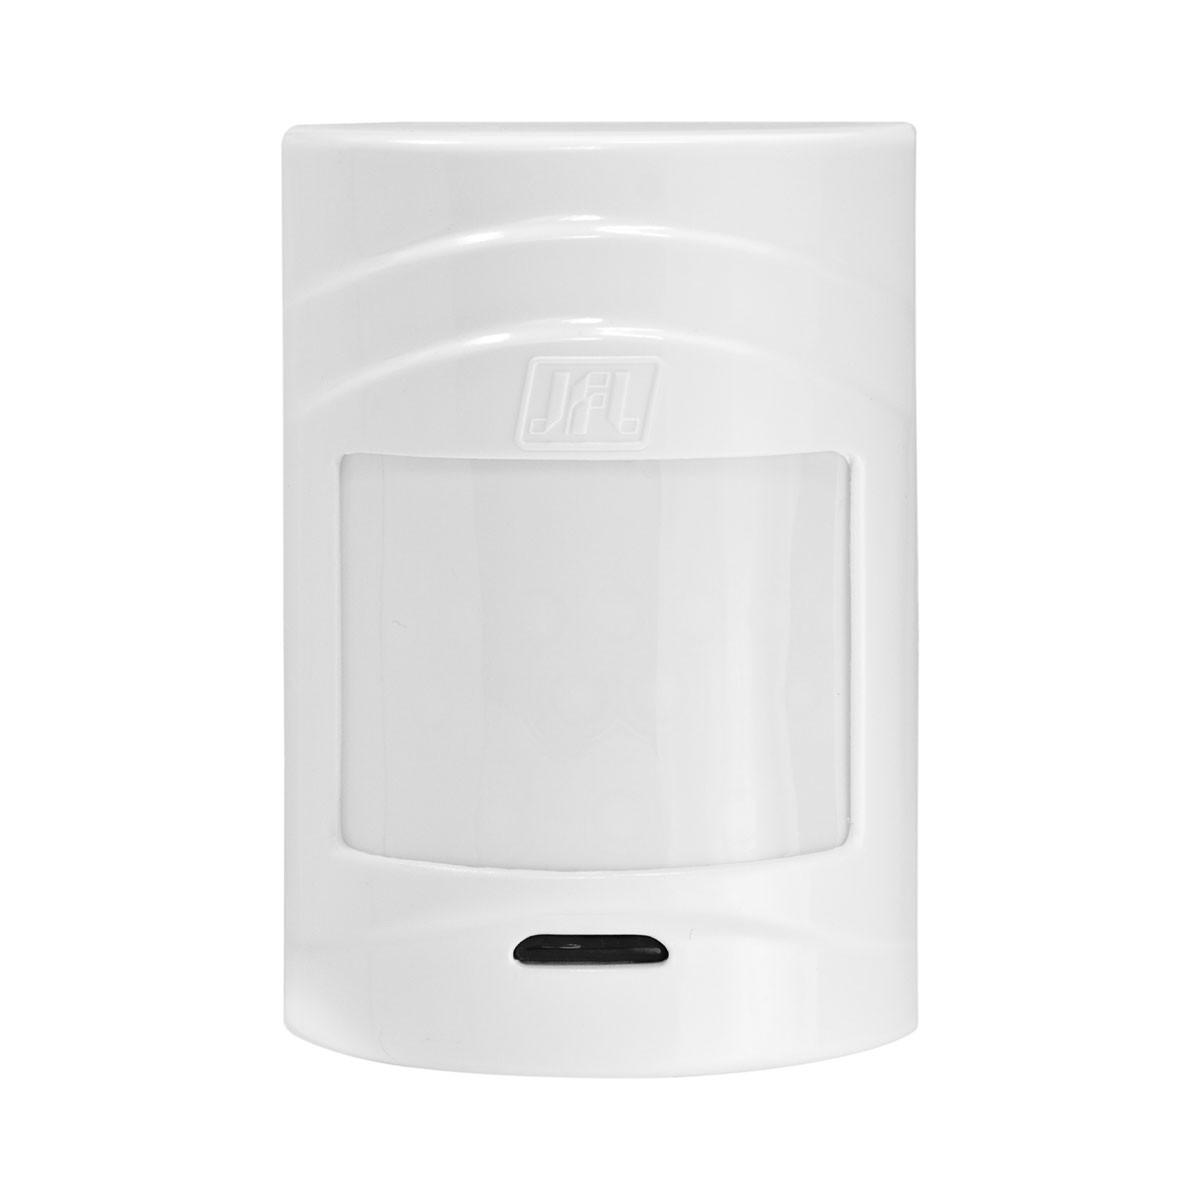 Kit Alarme Residencial Brisa Cell 804 Gsm 4 Sensor Sem Fio IrPet 530sf